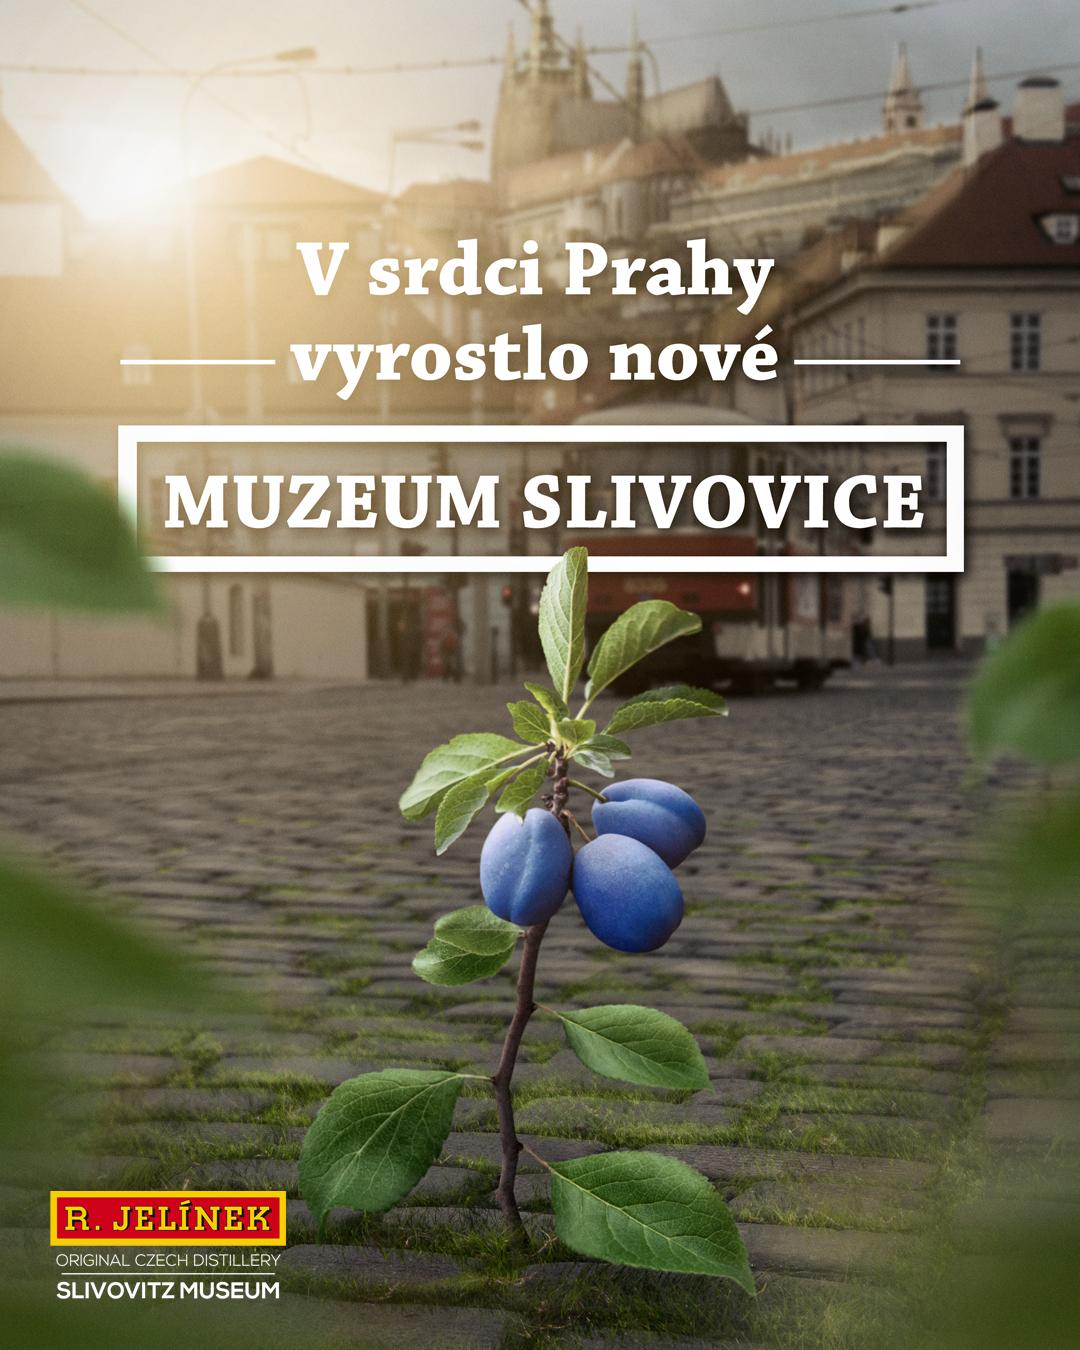 Vizuál z kampaně Muzea slivovice